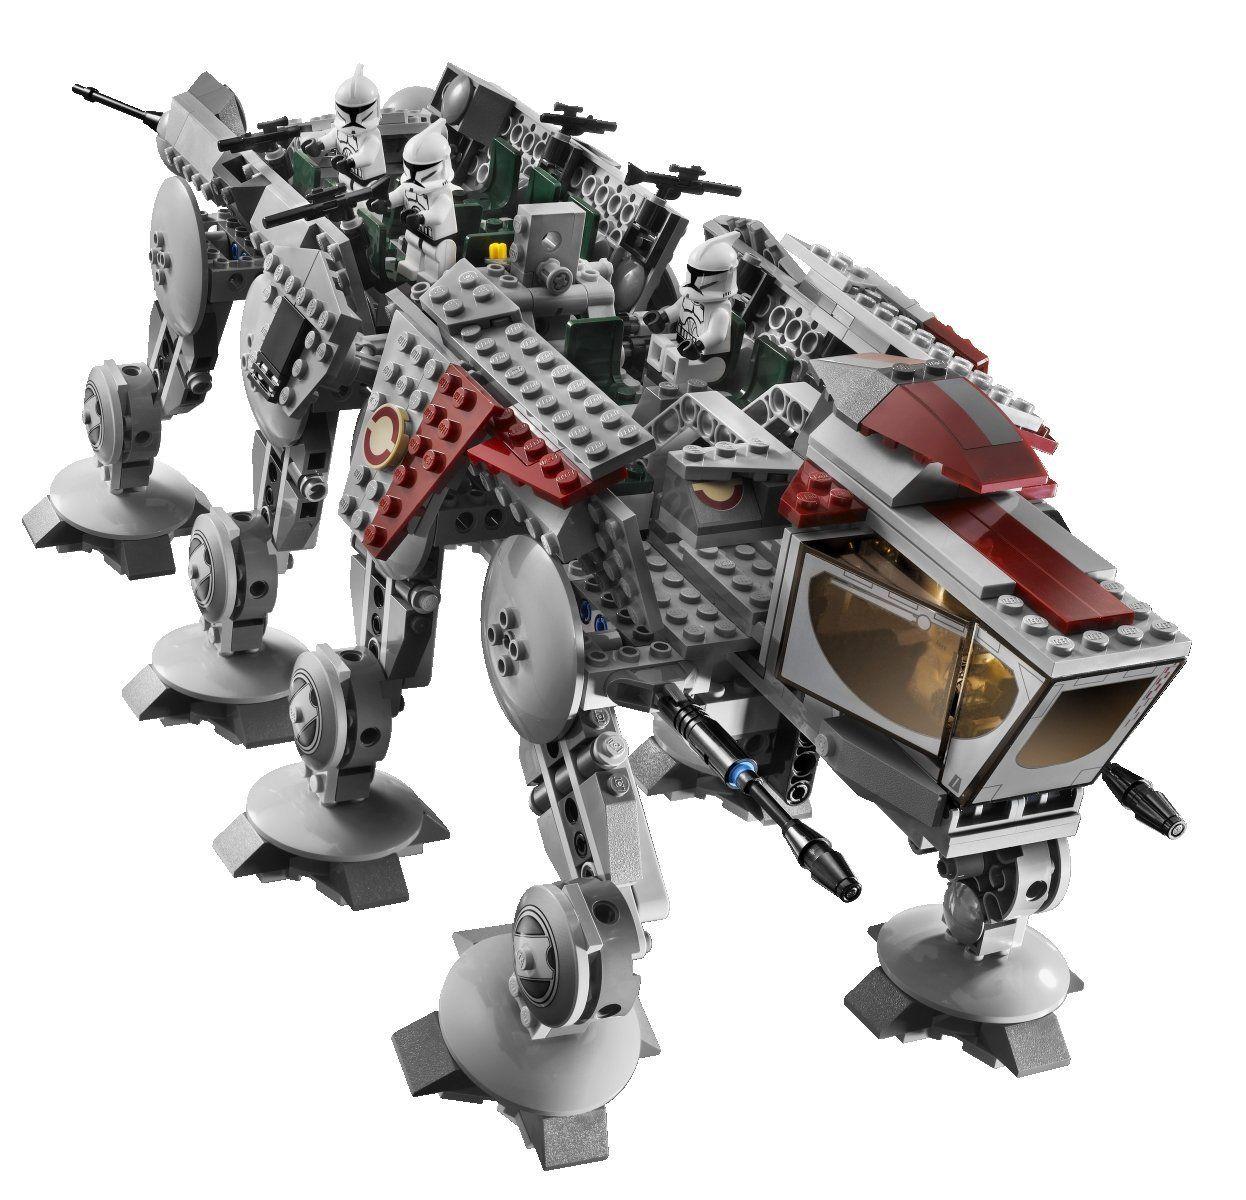 amazoncom lego star wars republic dropship with at ot walker 10195